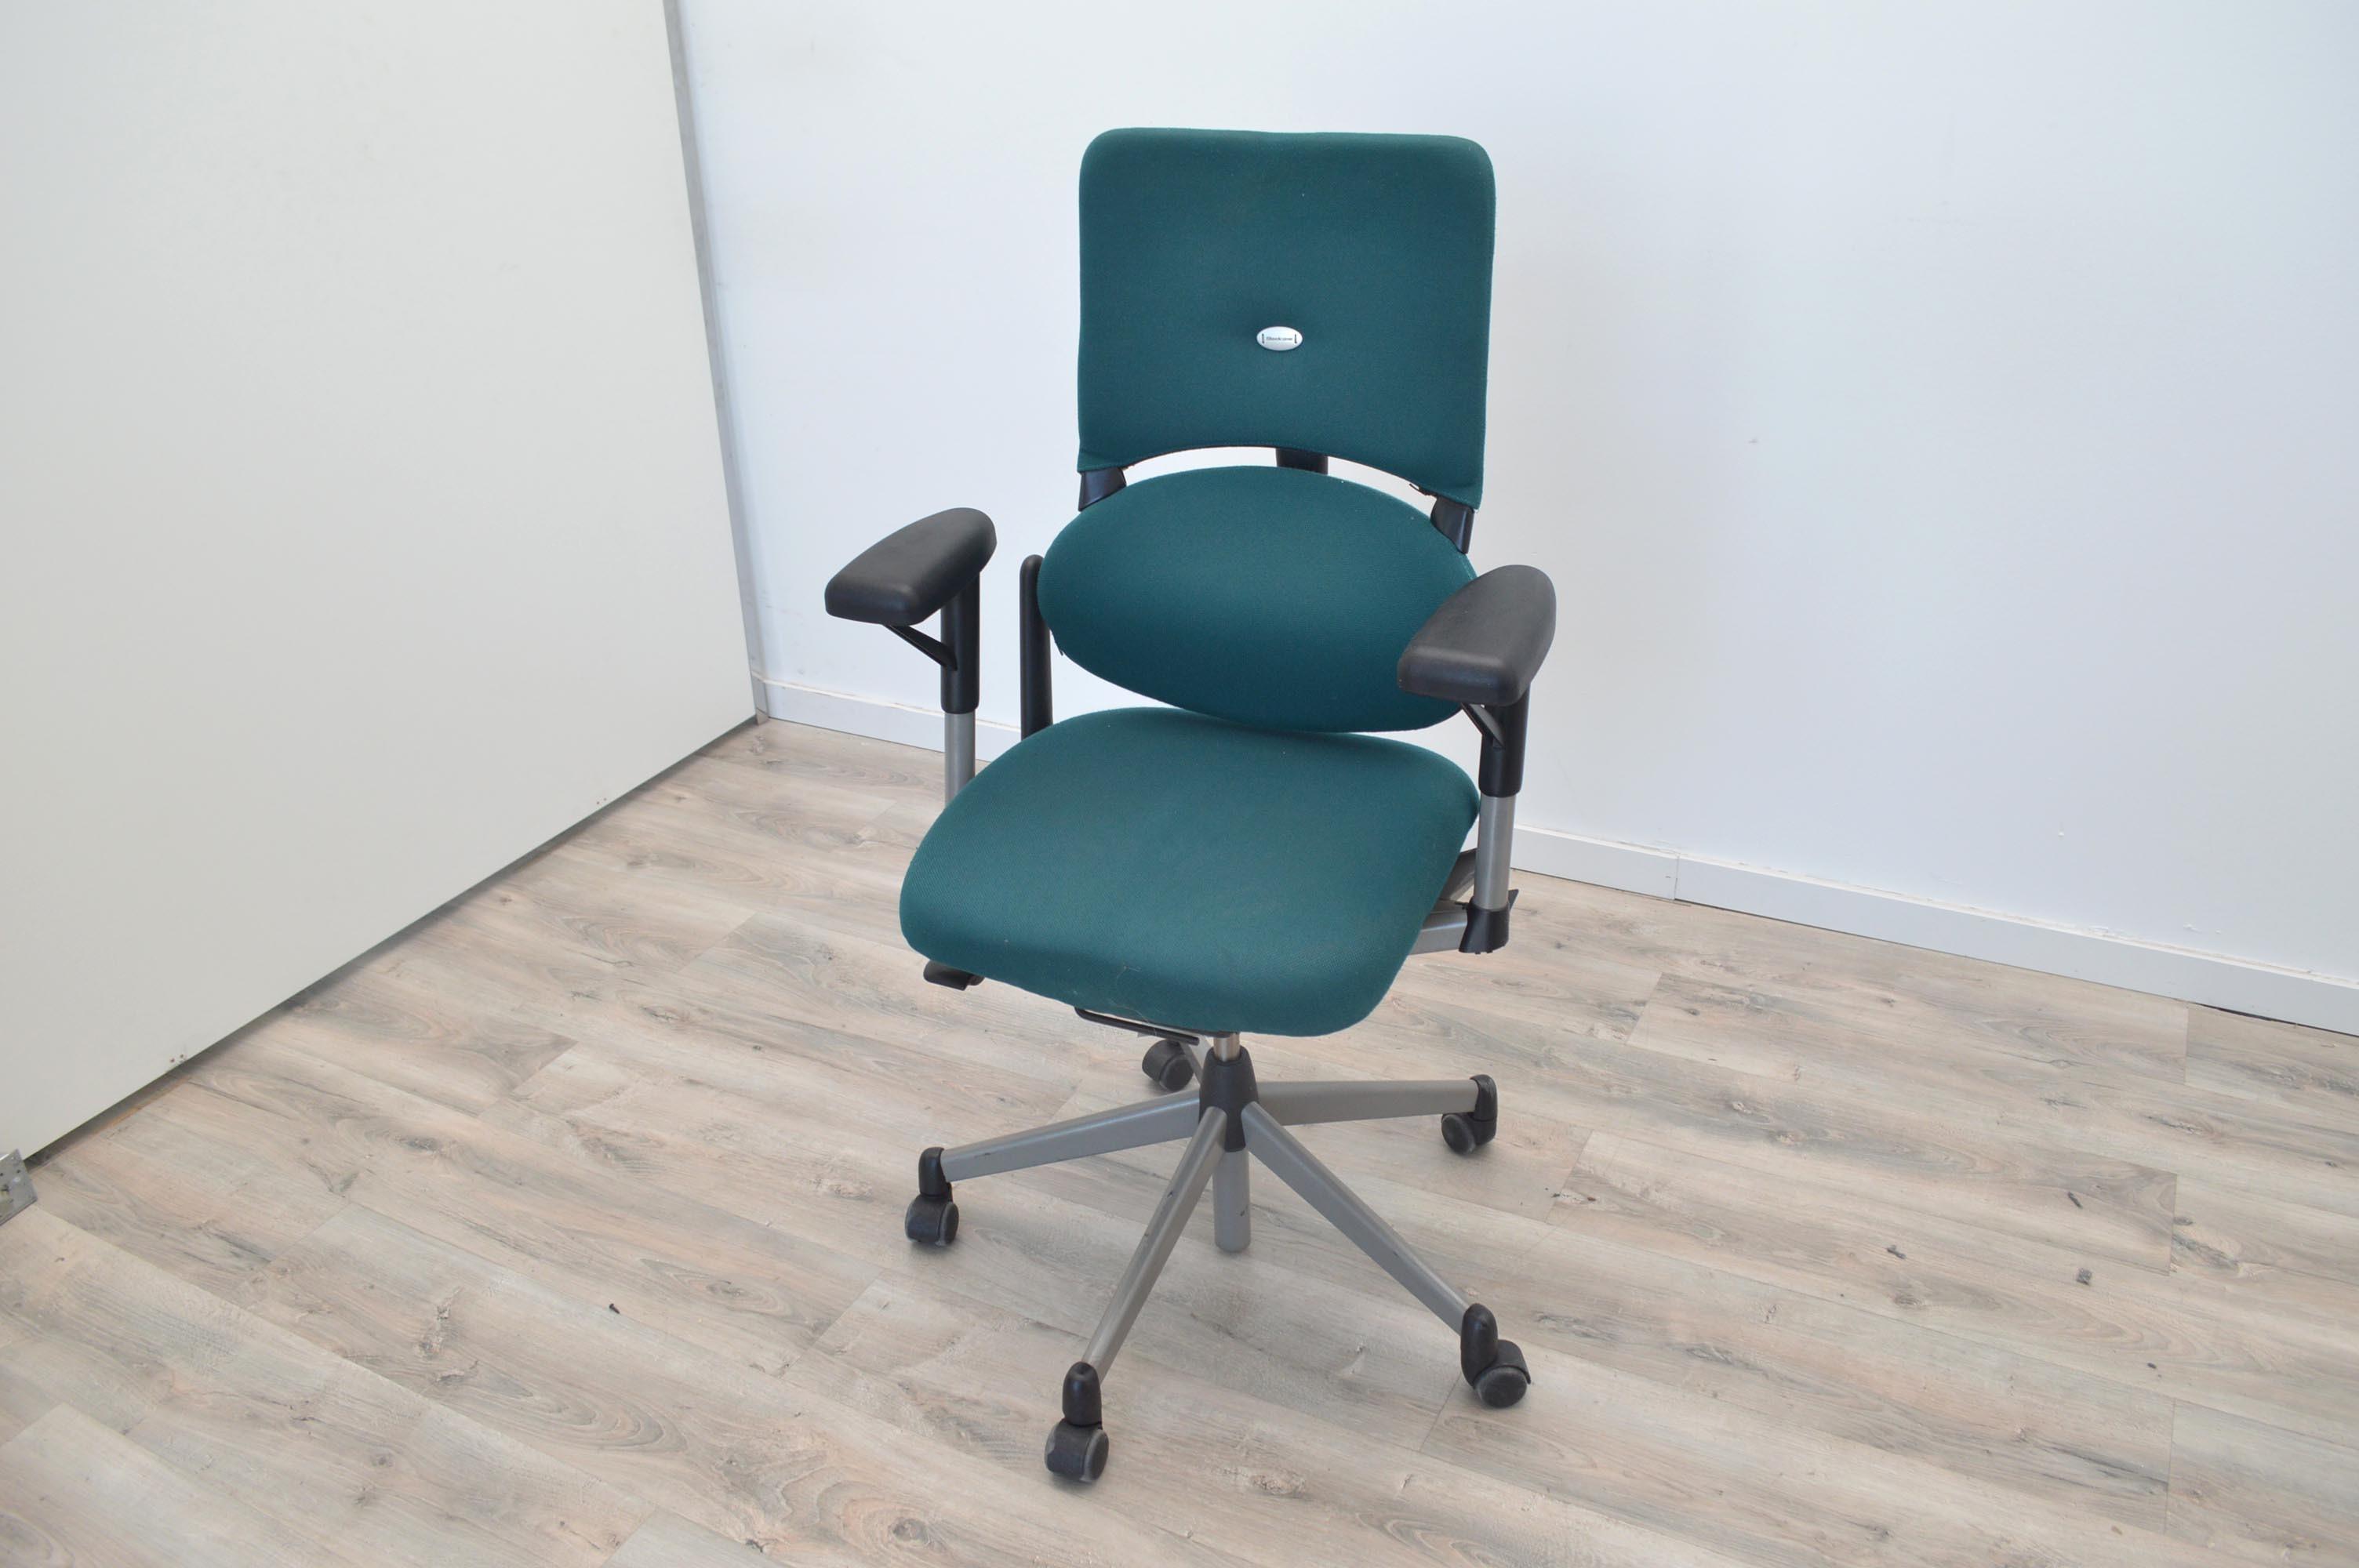 Sillas vitra segunda mano awesome silla de esccritoio - Sillas vitra precios ...